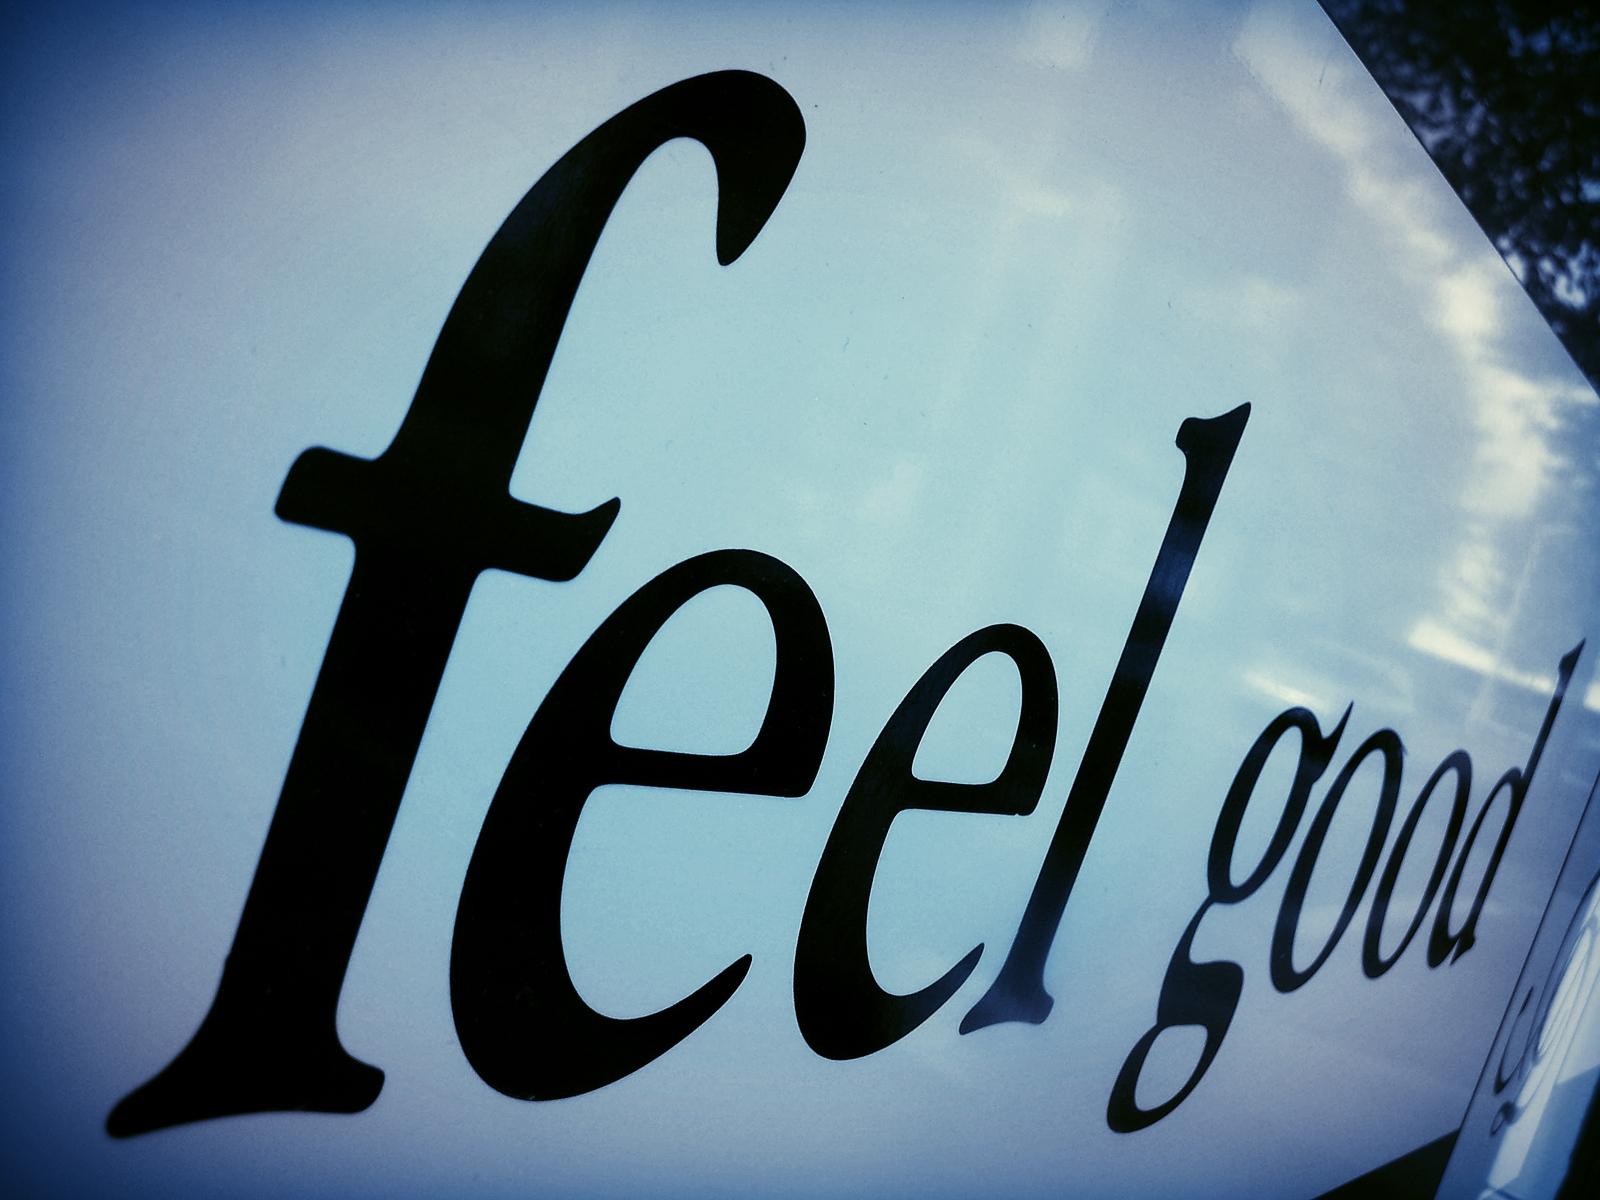 feeling good images - photo #11